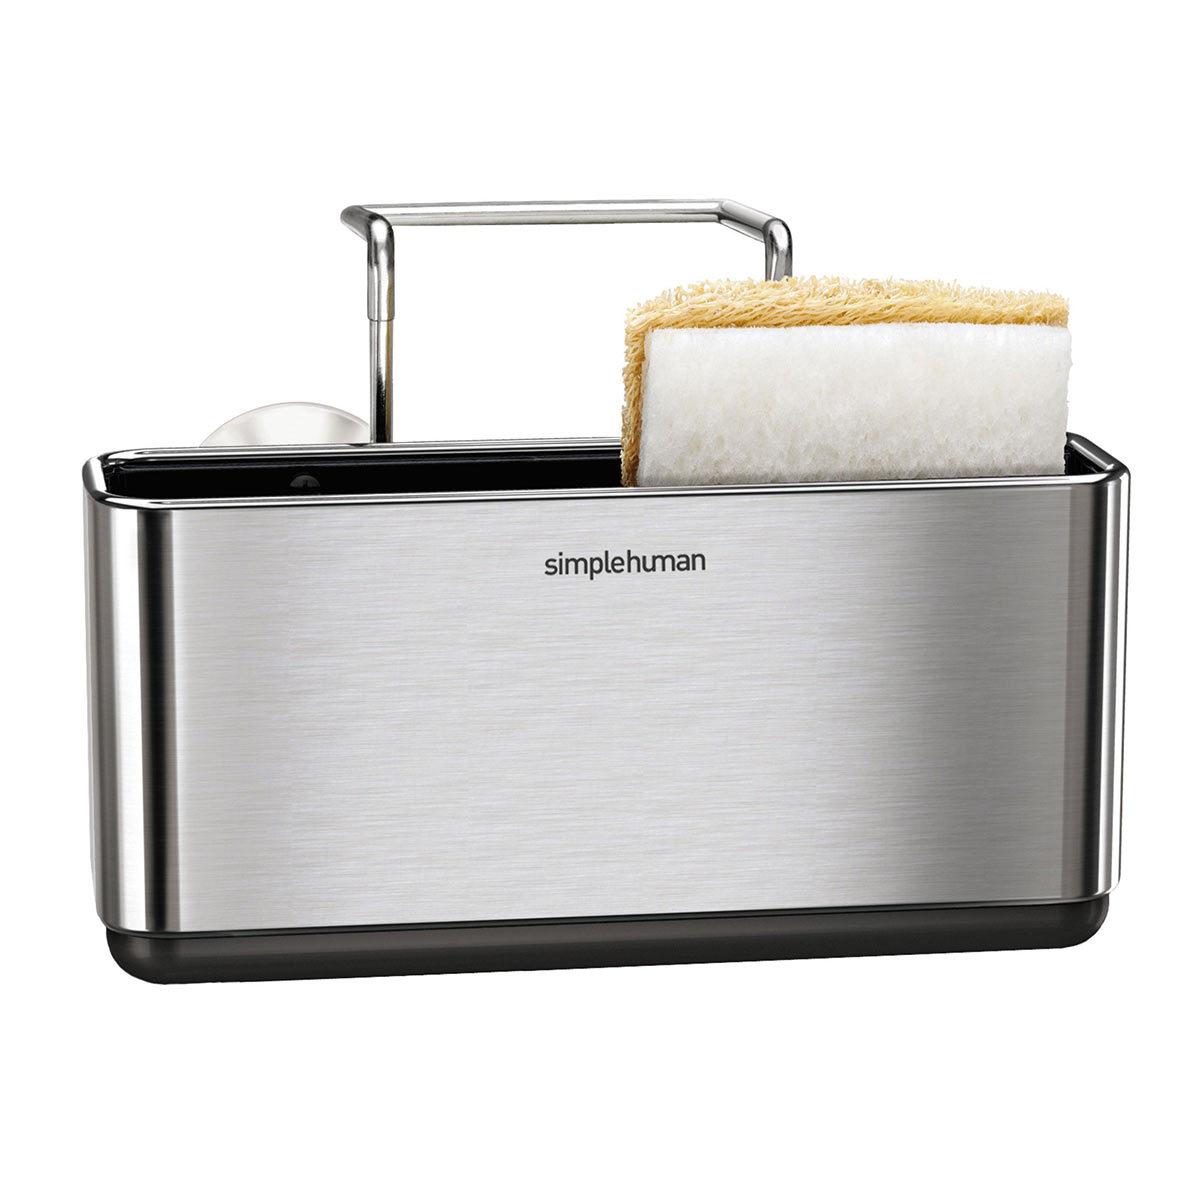 simplehuman brushed stainless steel slim sink caddy costco uk